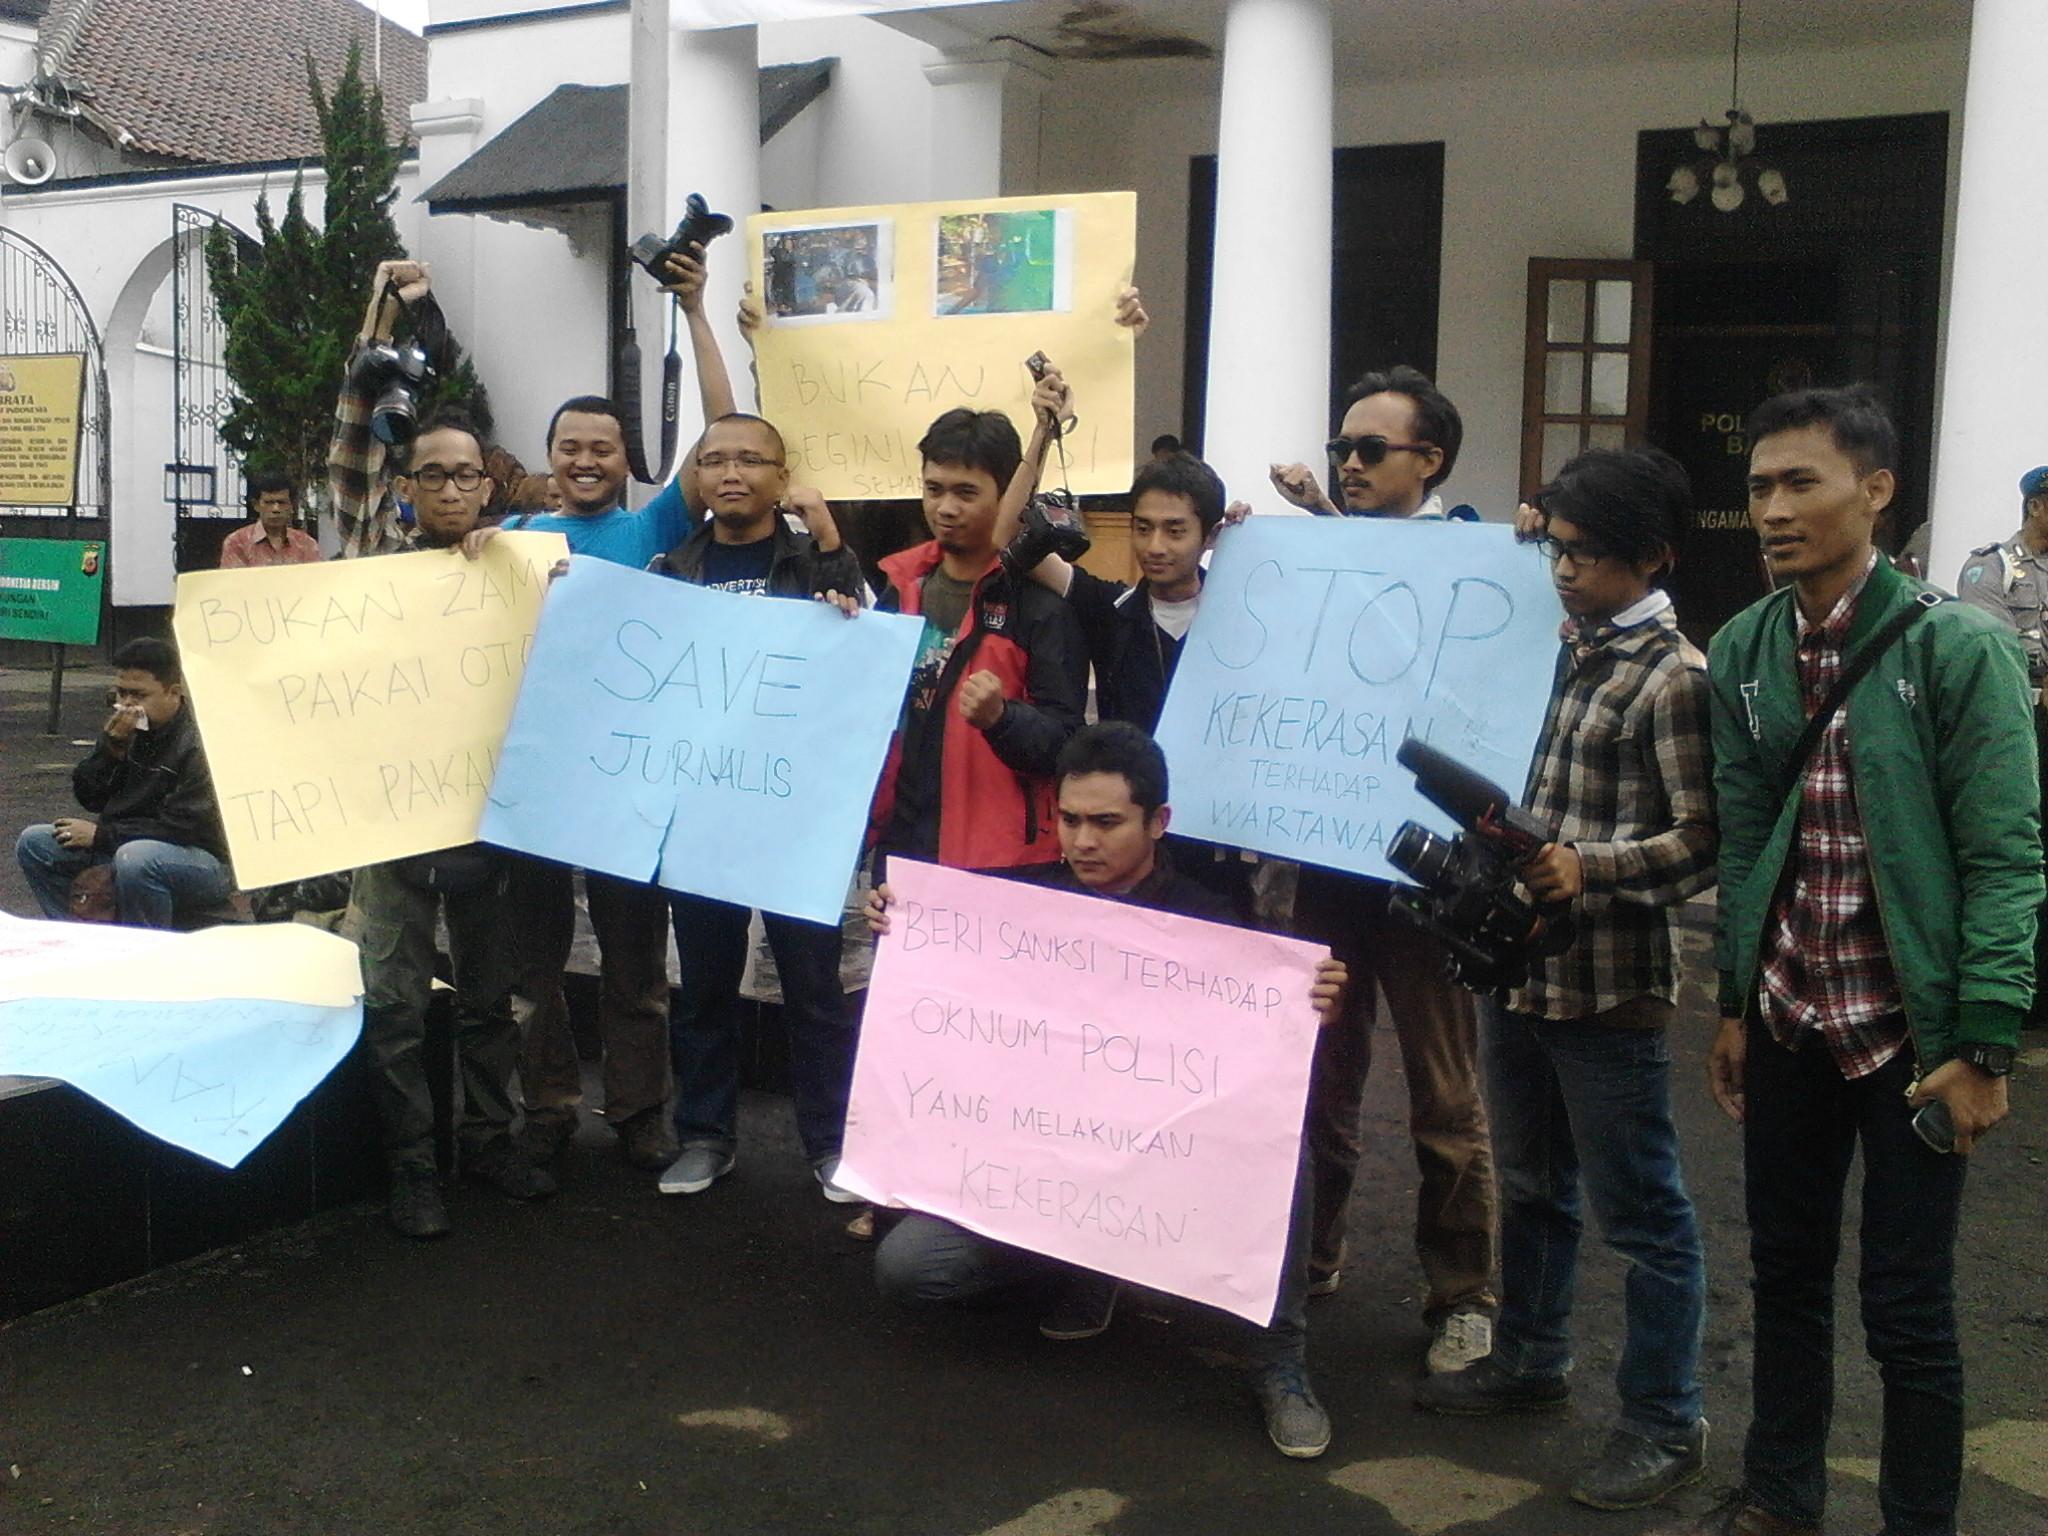 Mak Ar Dipukul Puluhan Jurnalis Bandung Protes Jurnal Bandung